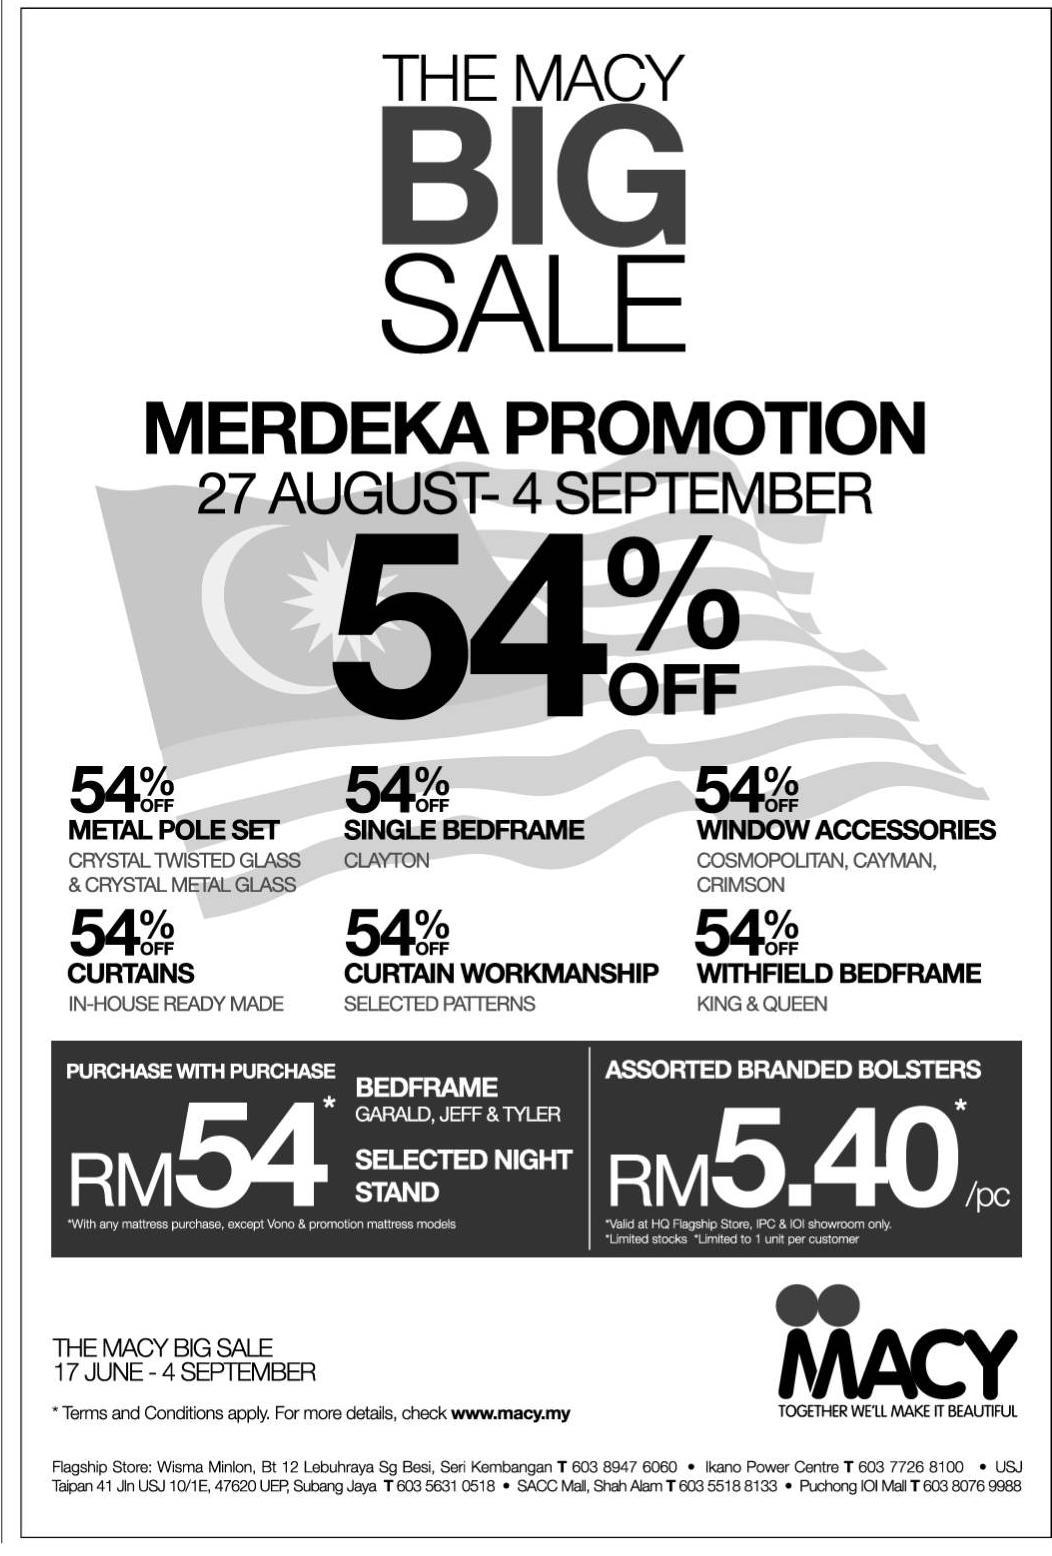 49189a076 The Macy Big Sale Merdeka Promotion (27 August - 4 September)